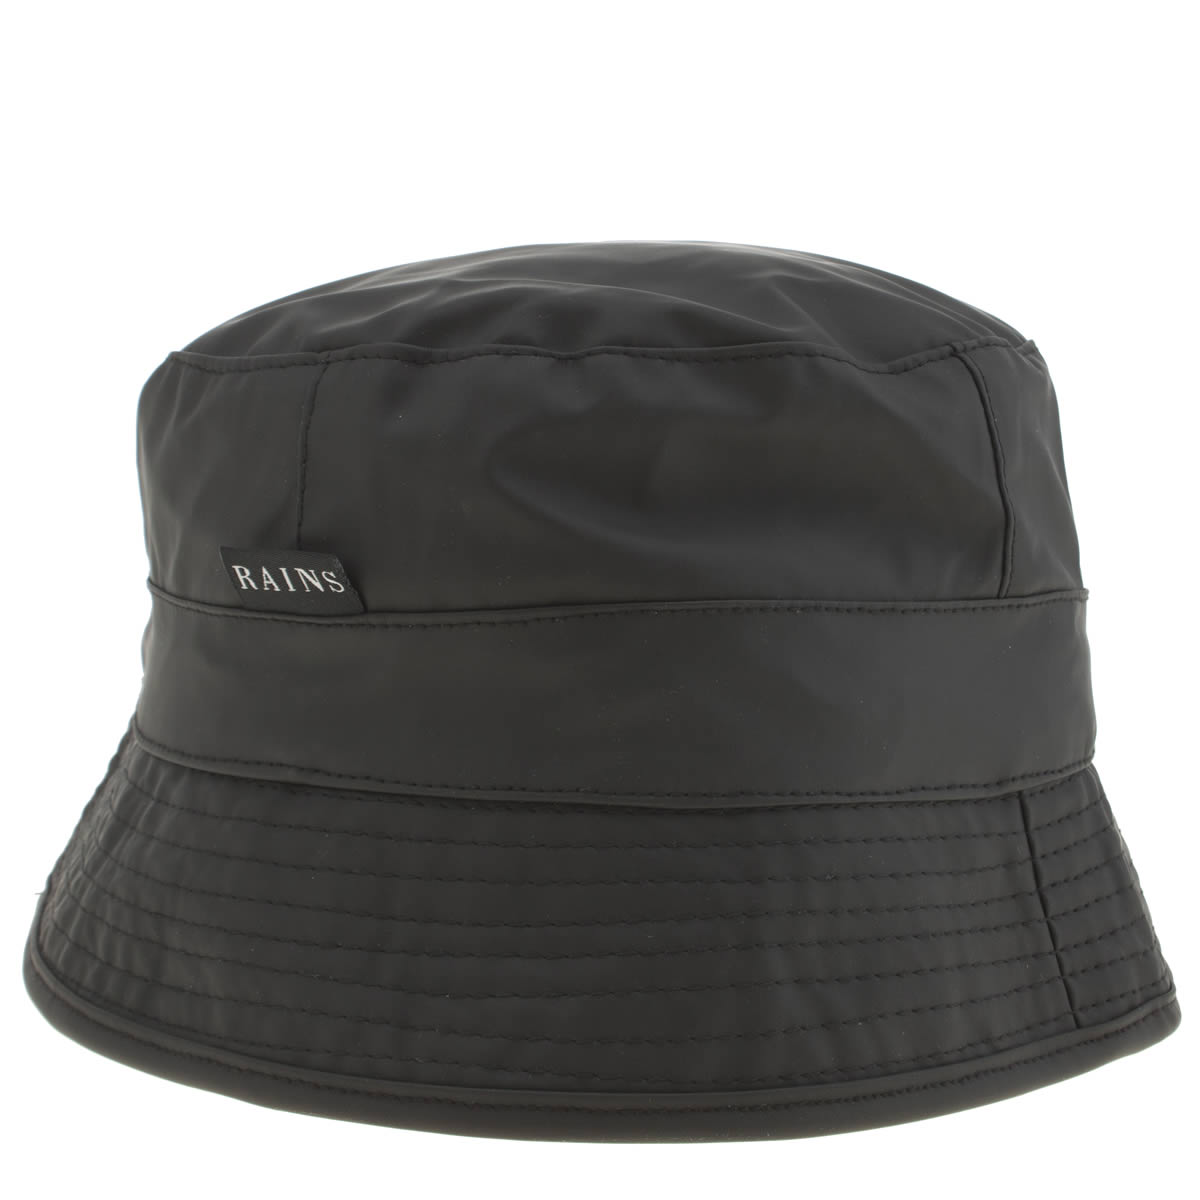 Rains Rains Black Bucket Hat Caps And Hats